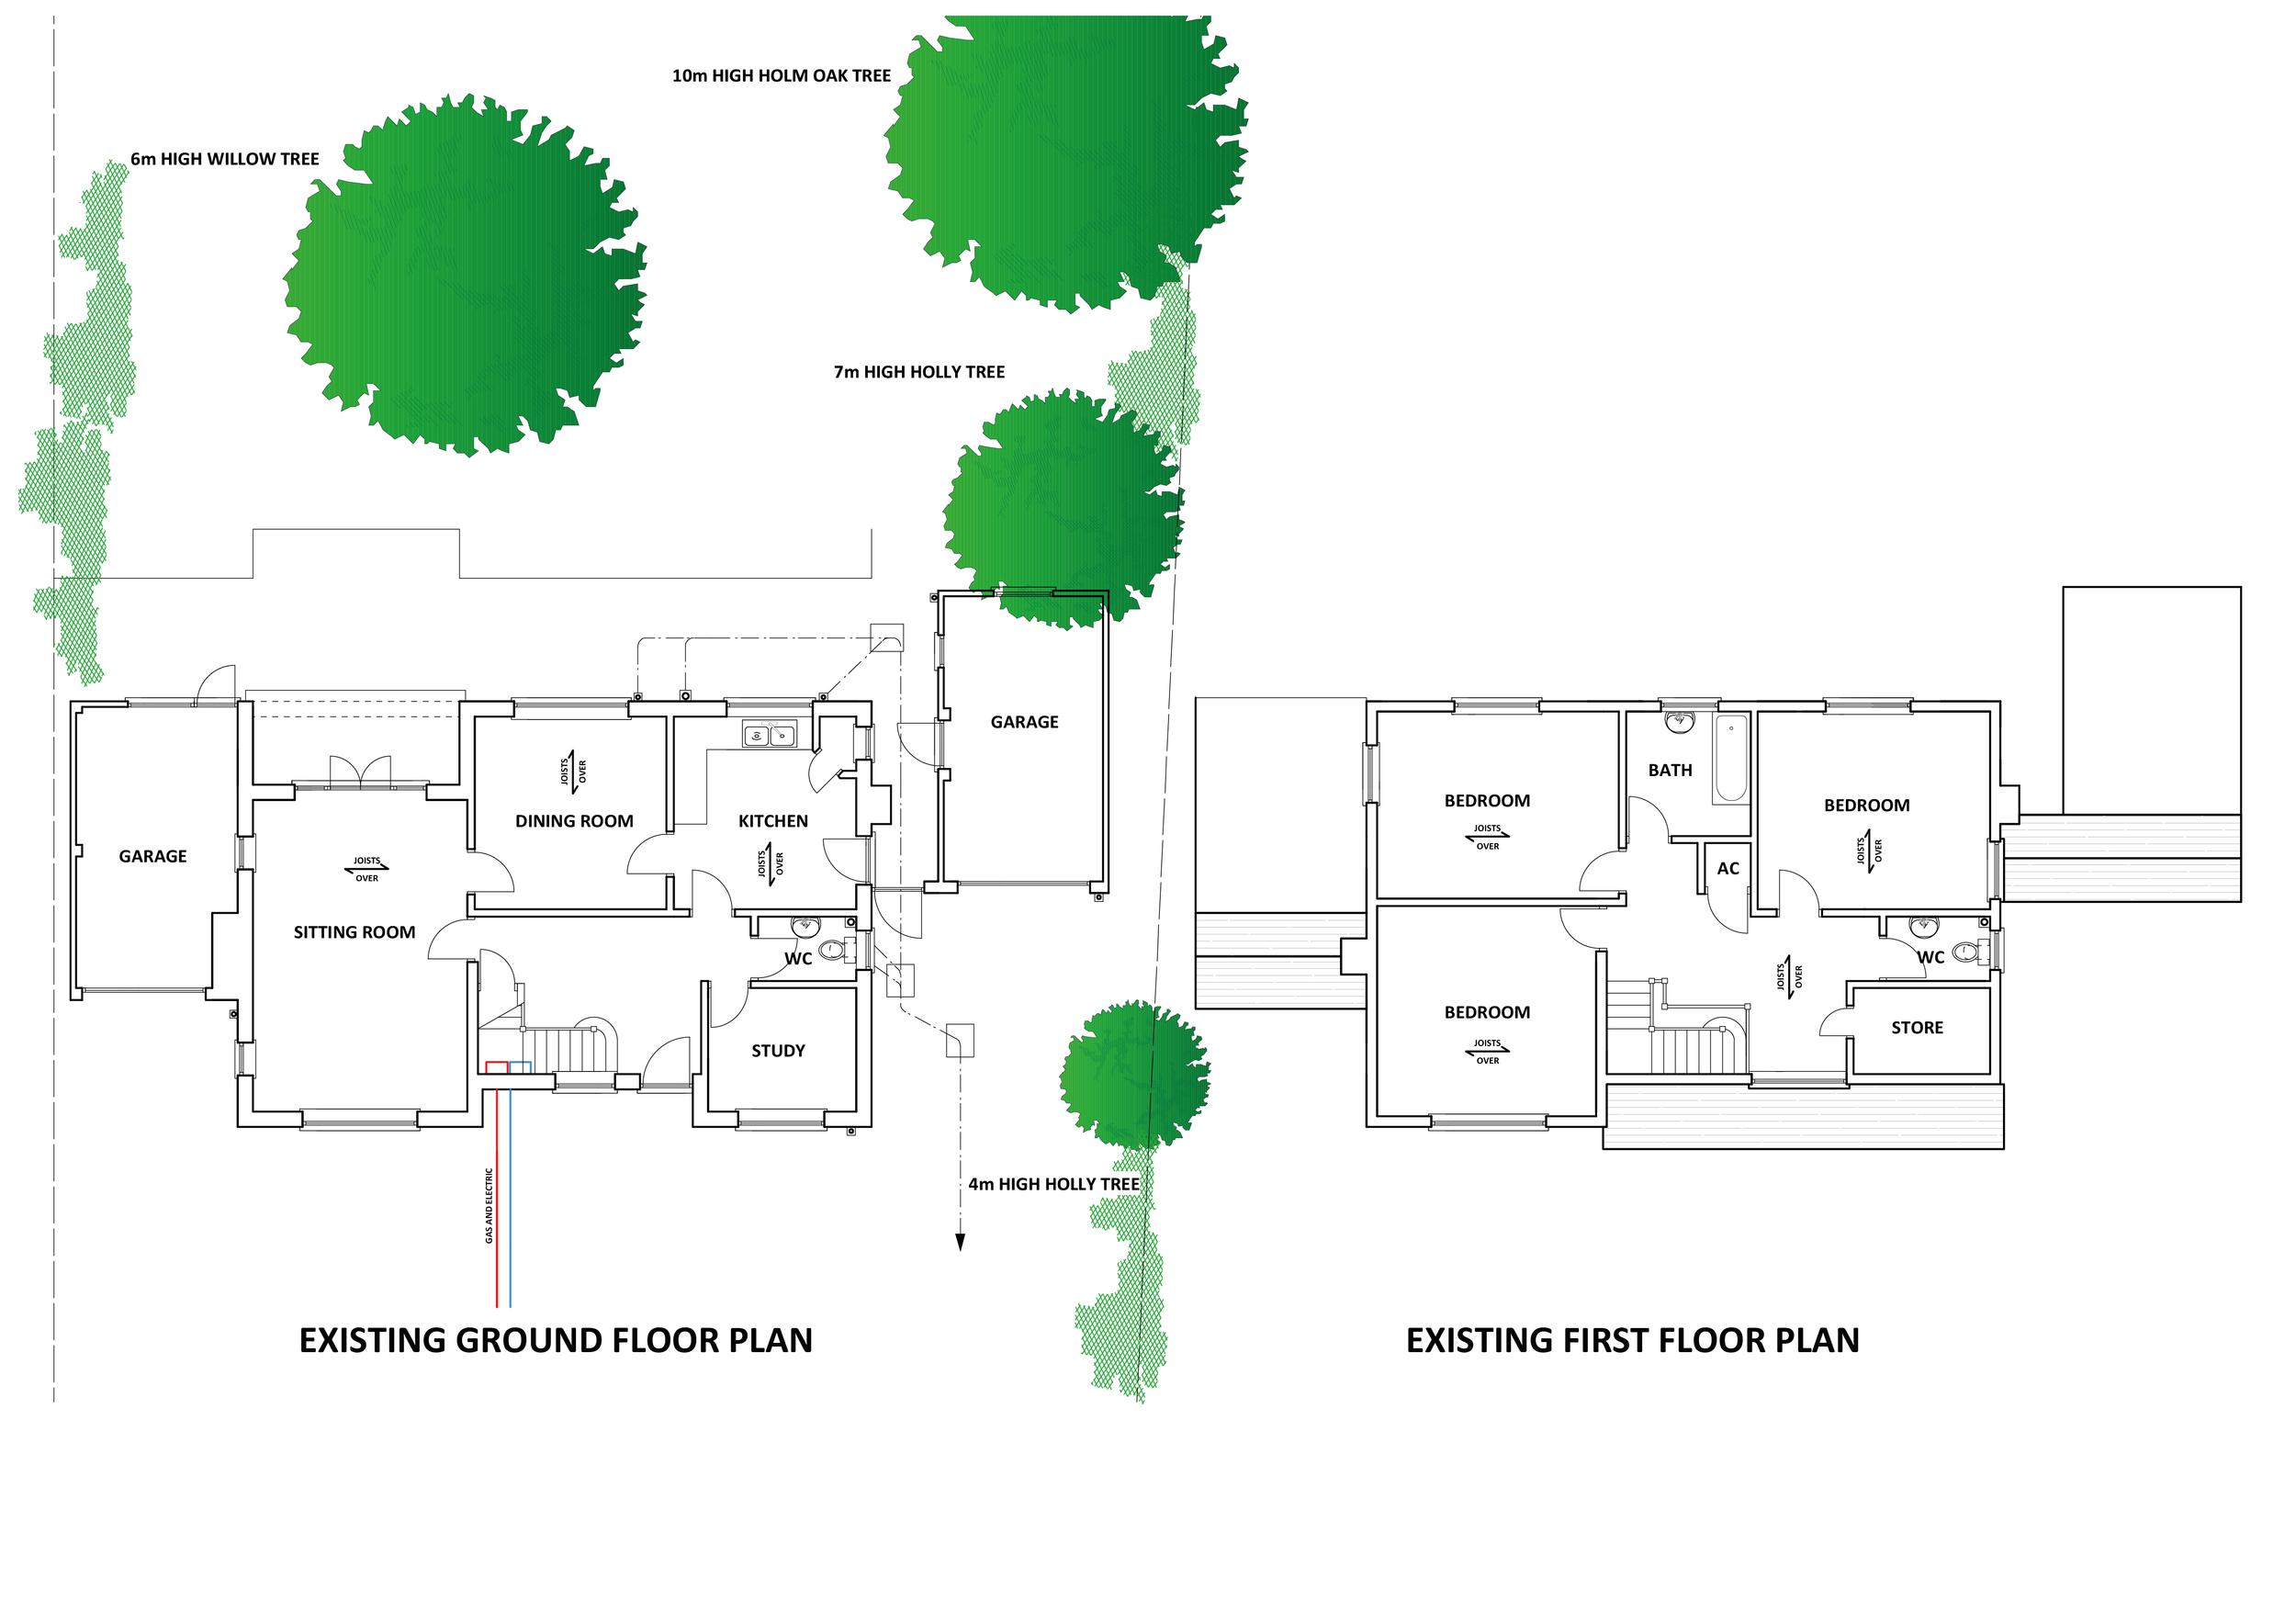 Floor Plan Before/After